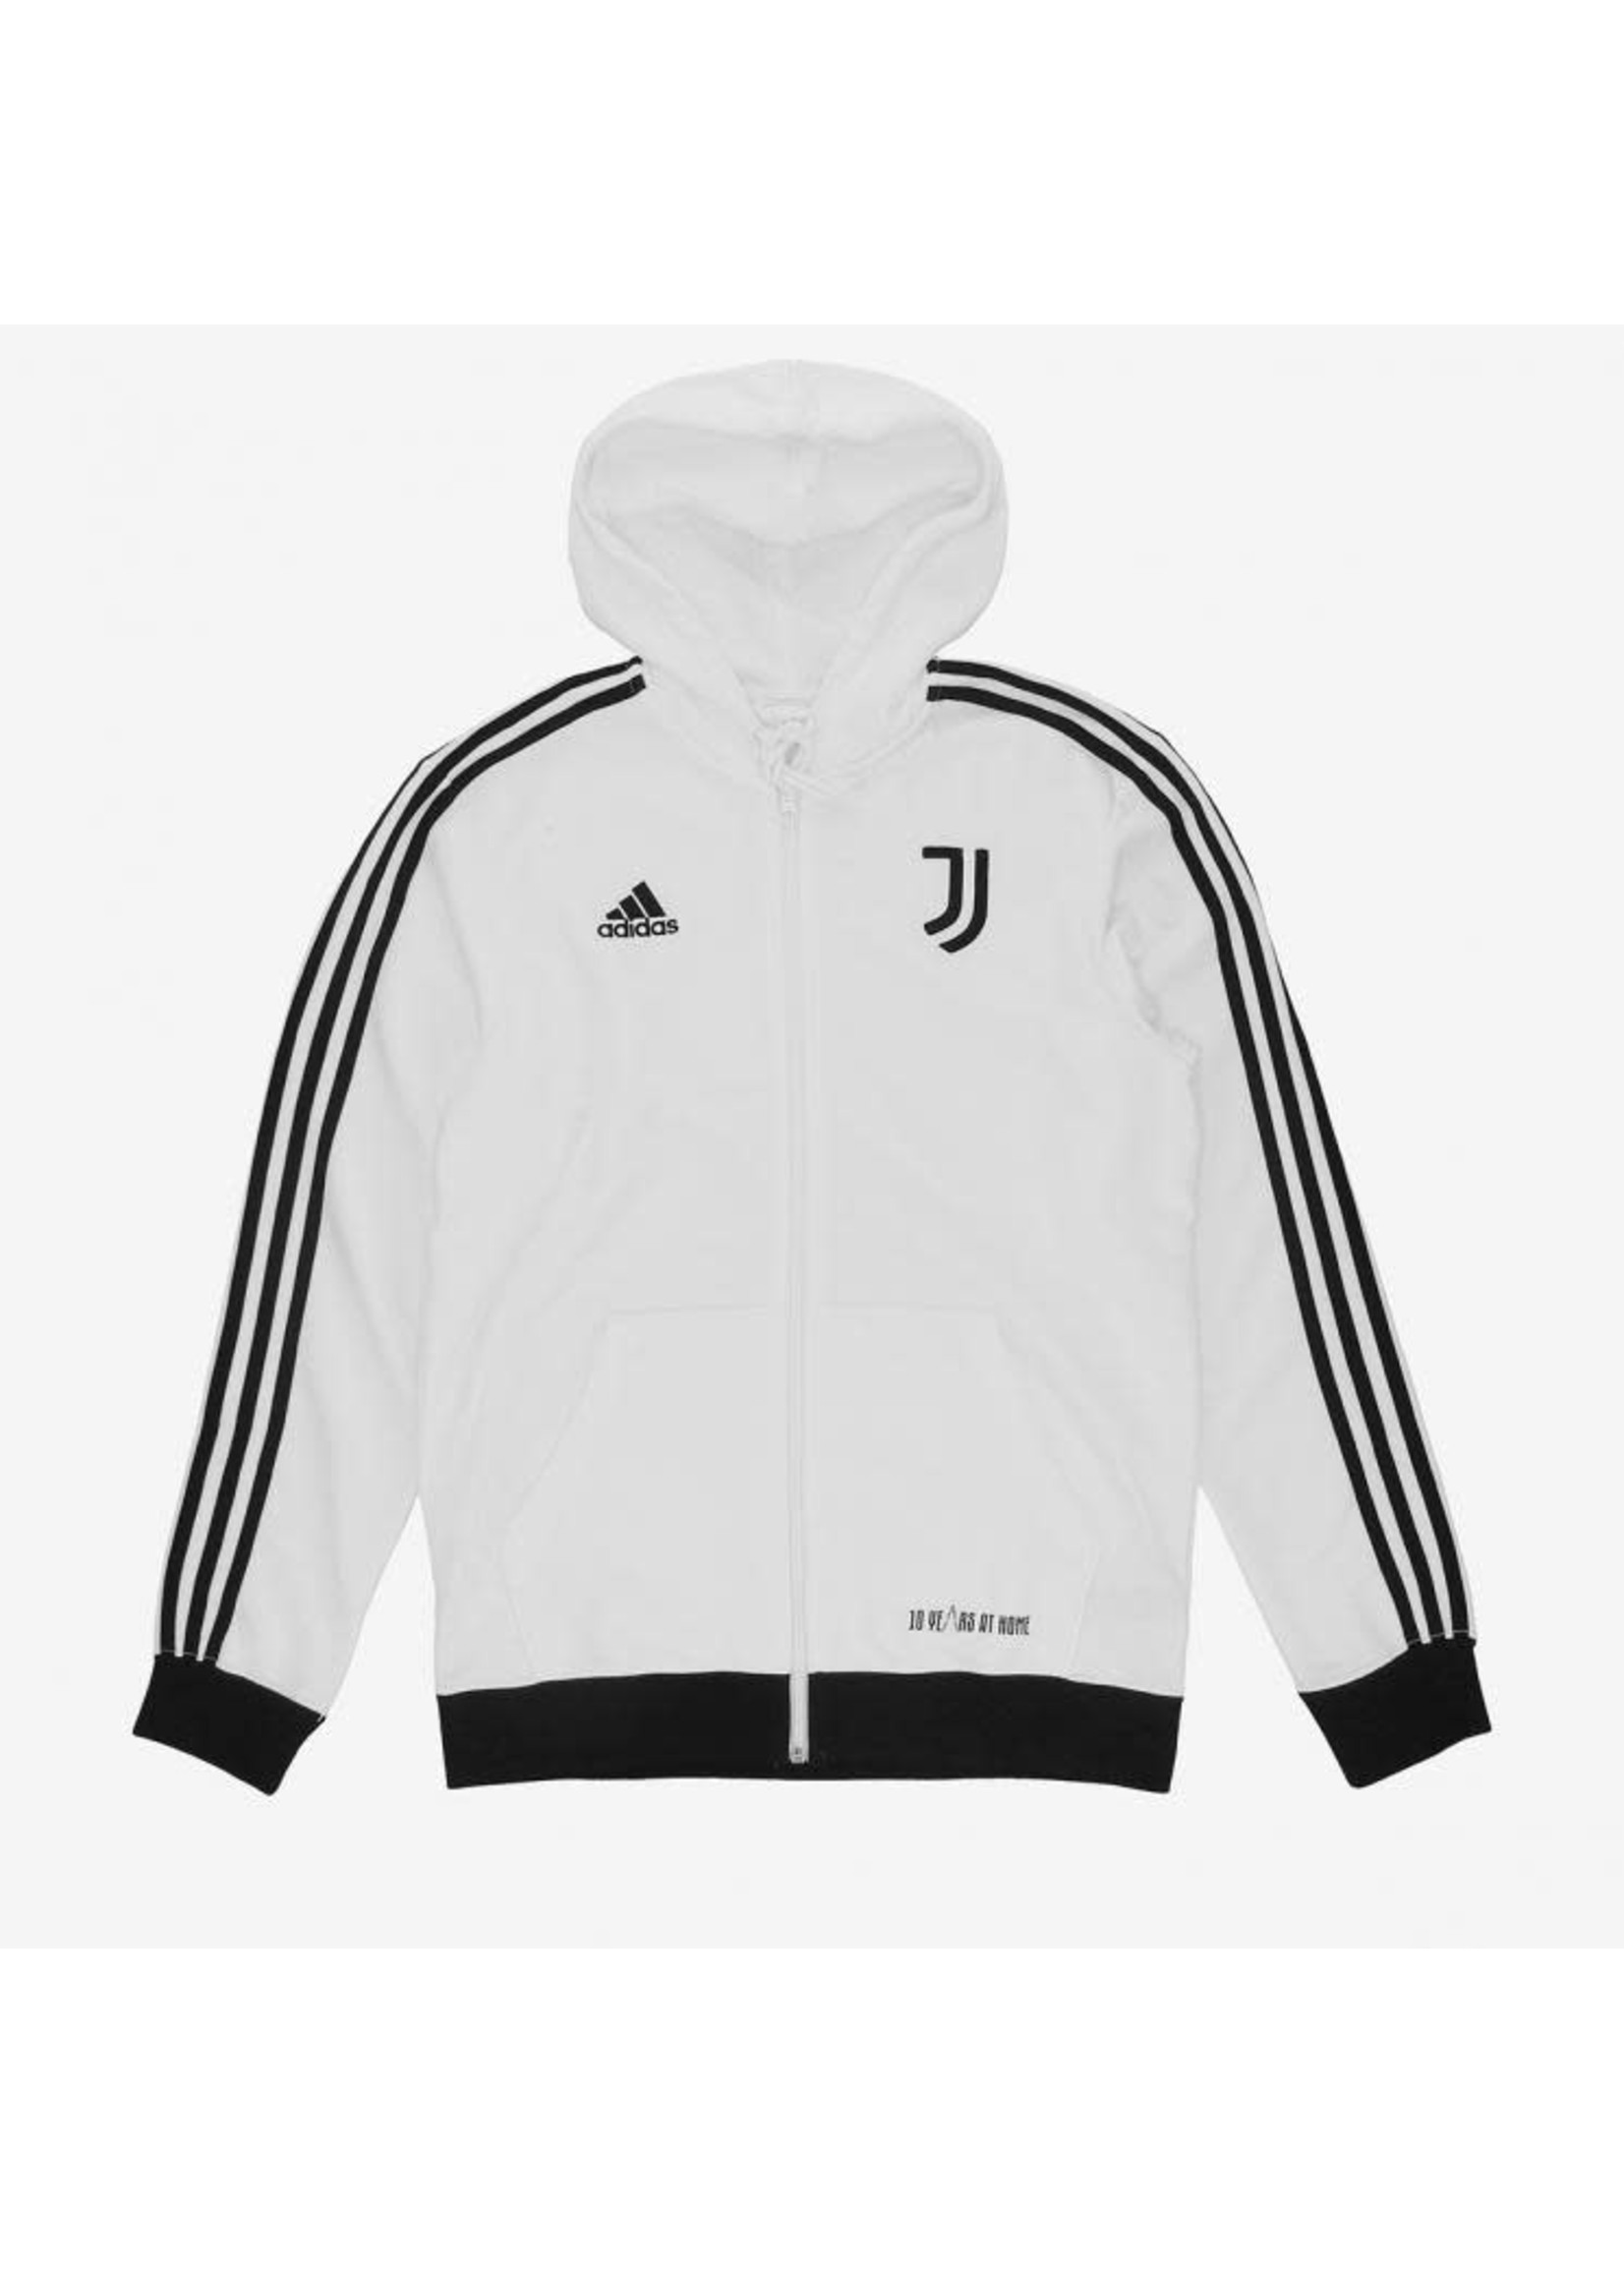 Adidas JUVENTUS 3-STRIPE FULL ZIP HOODIE 2021/22